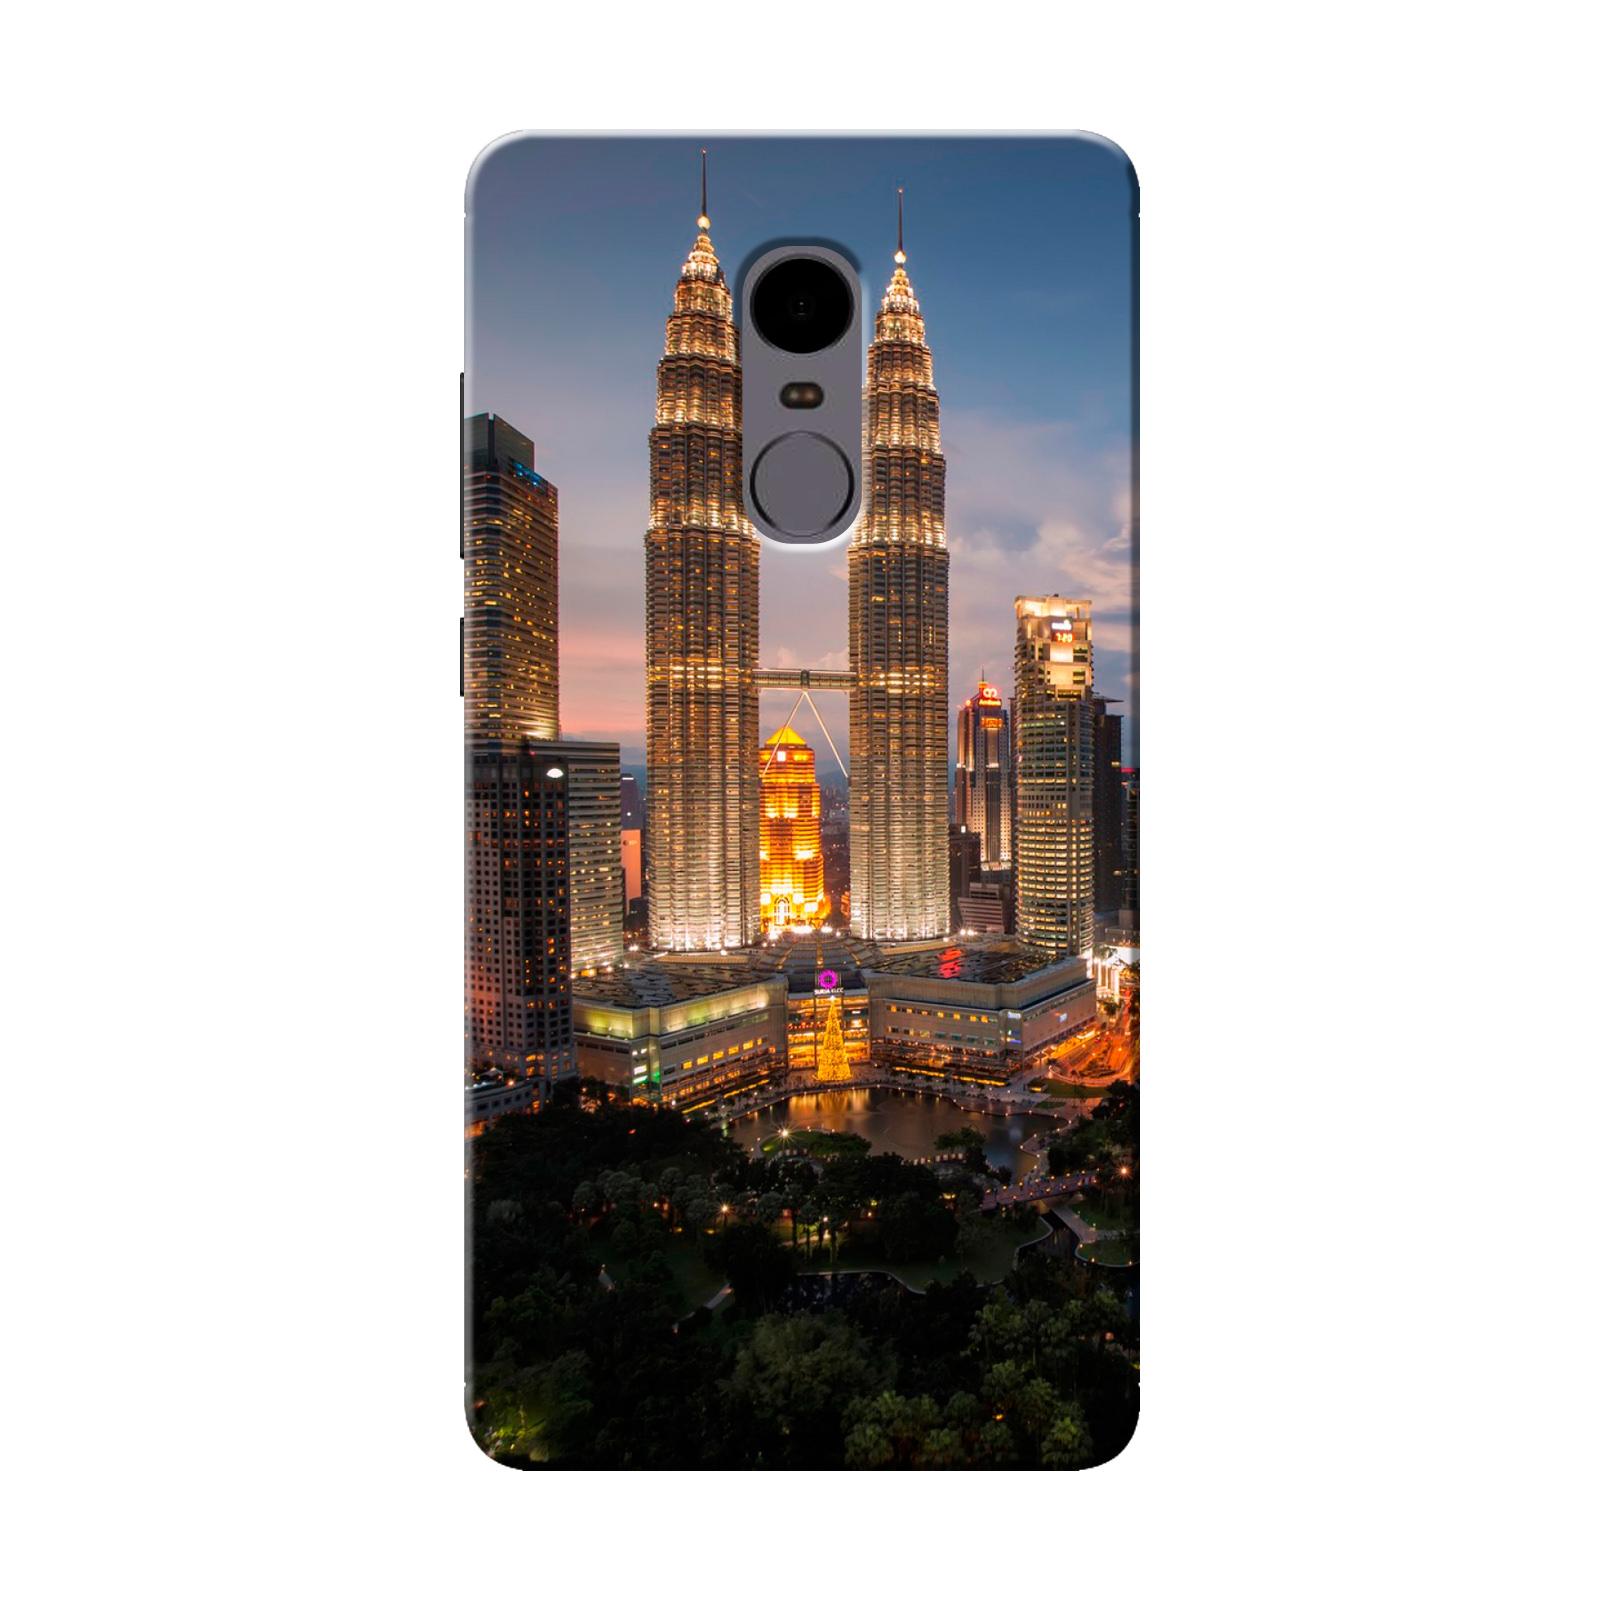 sairafashions Wild Thunder Mi Redmi Note 4 Mobile Back Cover Case And Designer Printed Hard Flexible Mobile Case Cover  - 1127